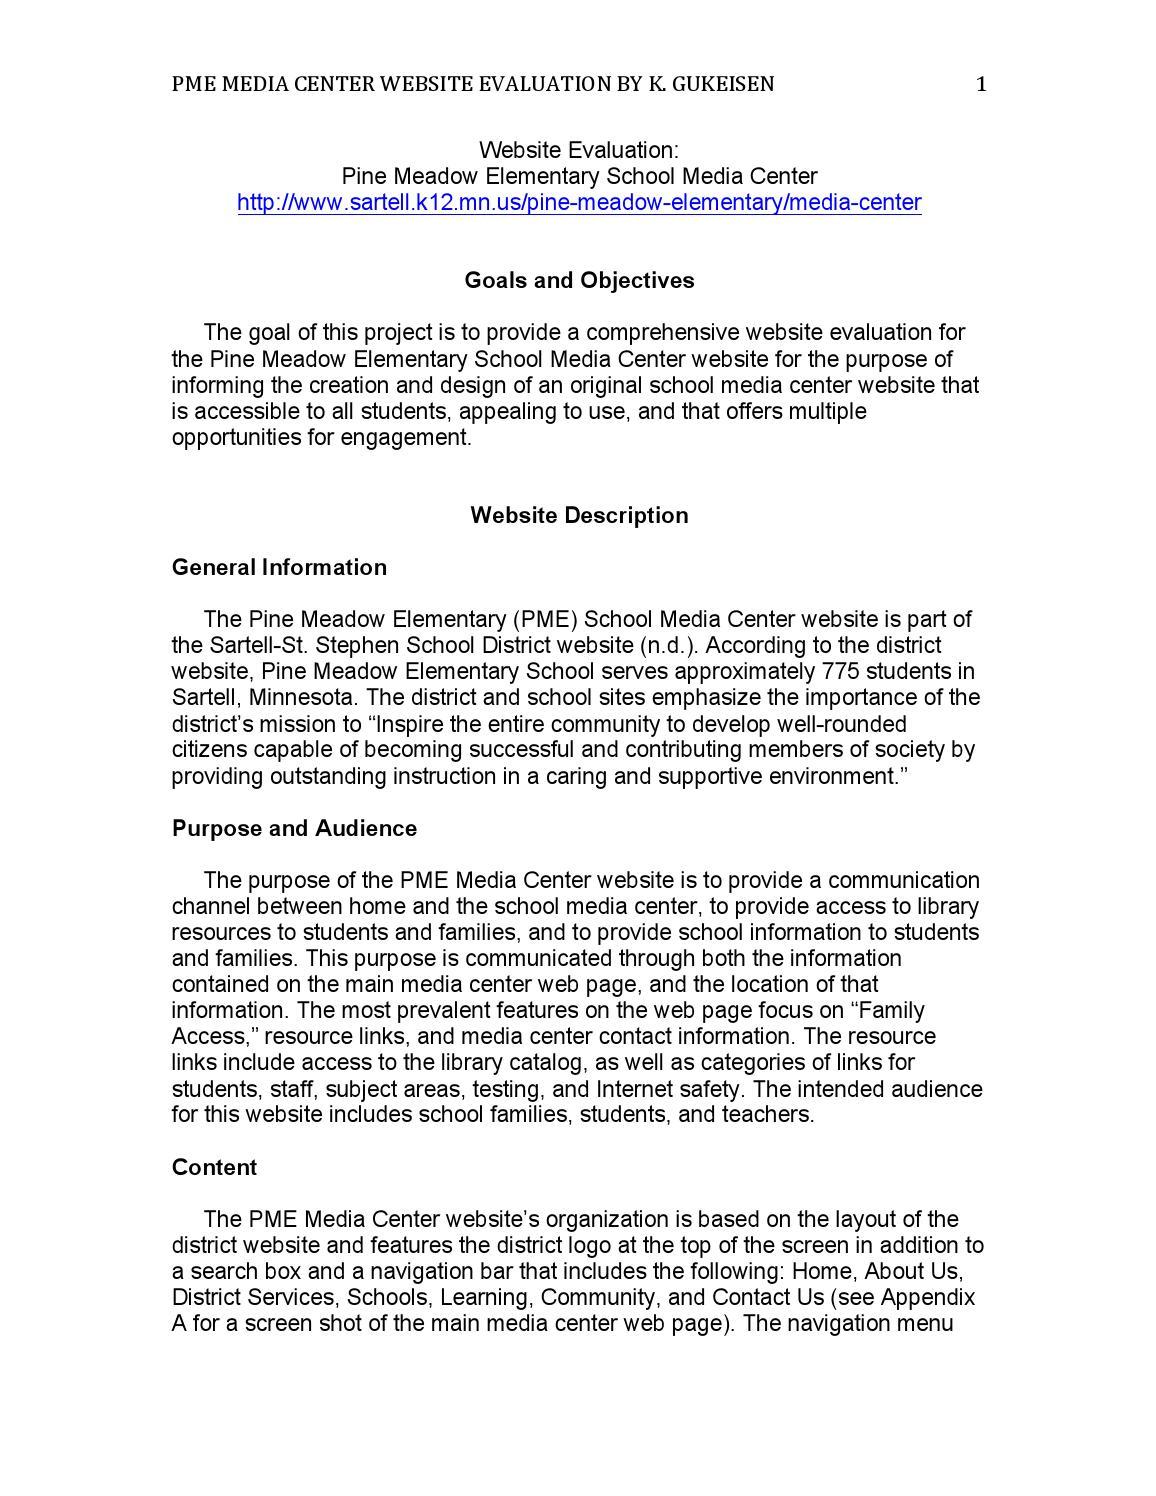 School Media Center Web Site Assessment & Design by Kate